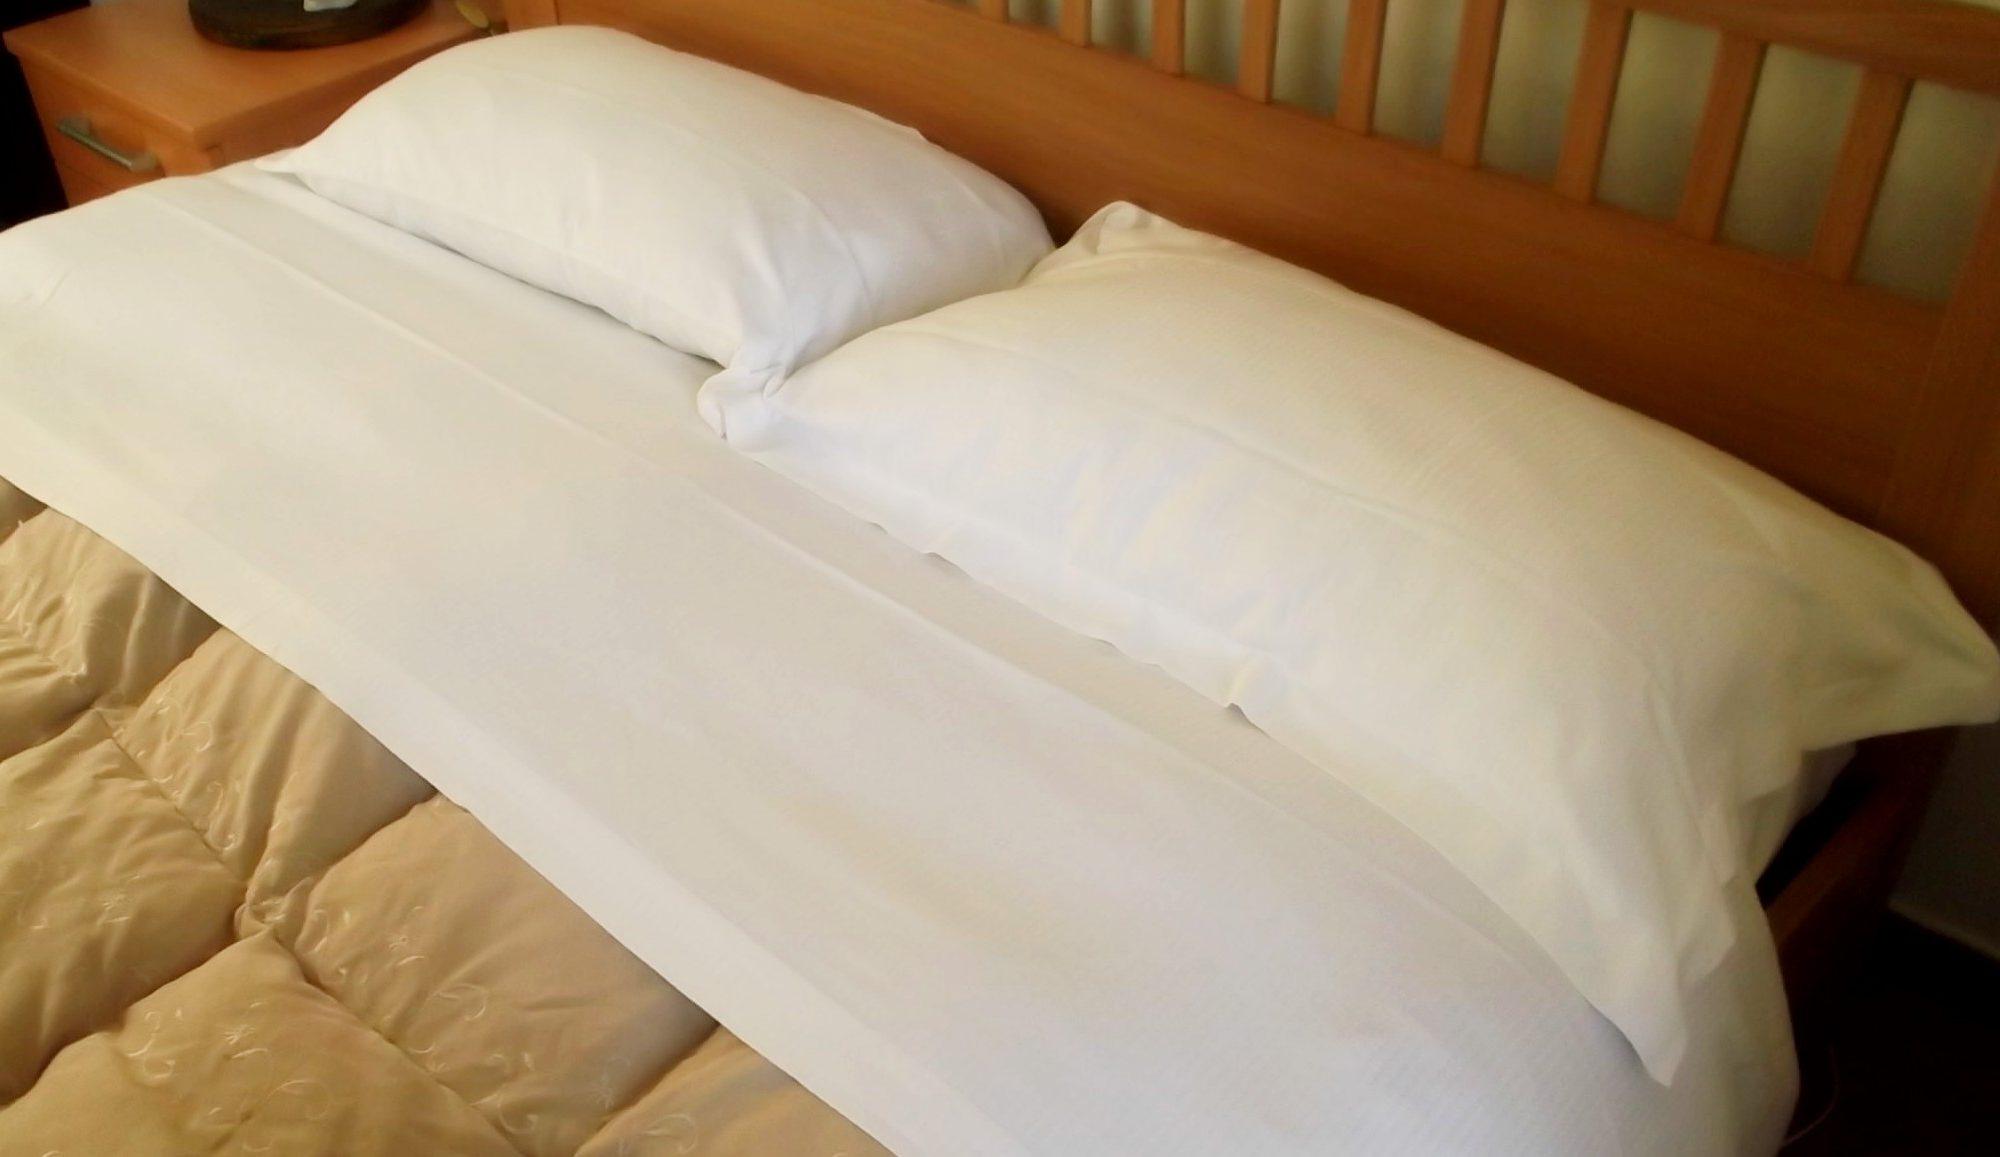 noleggio lenzuola biancheria da camera hotel umbria perugia terni